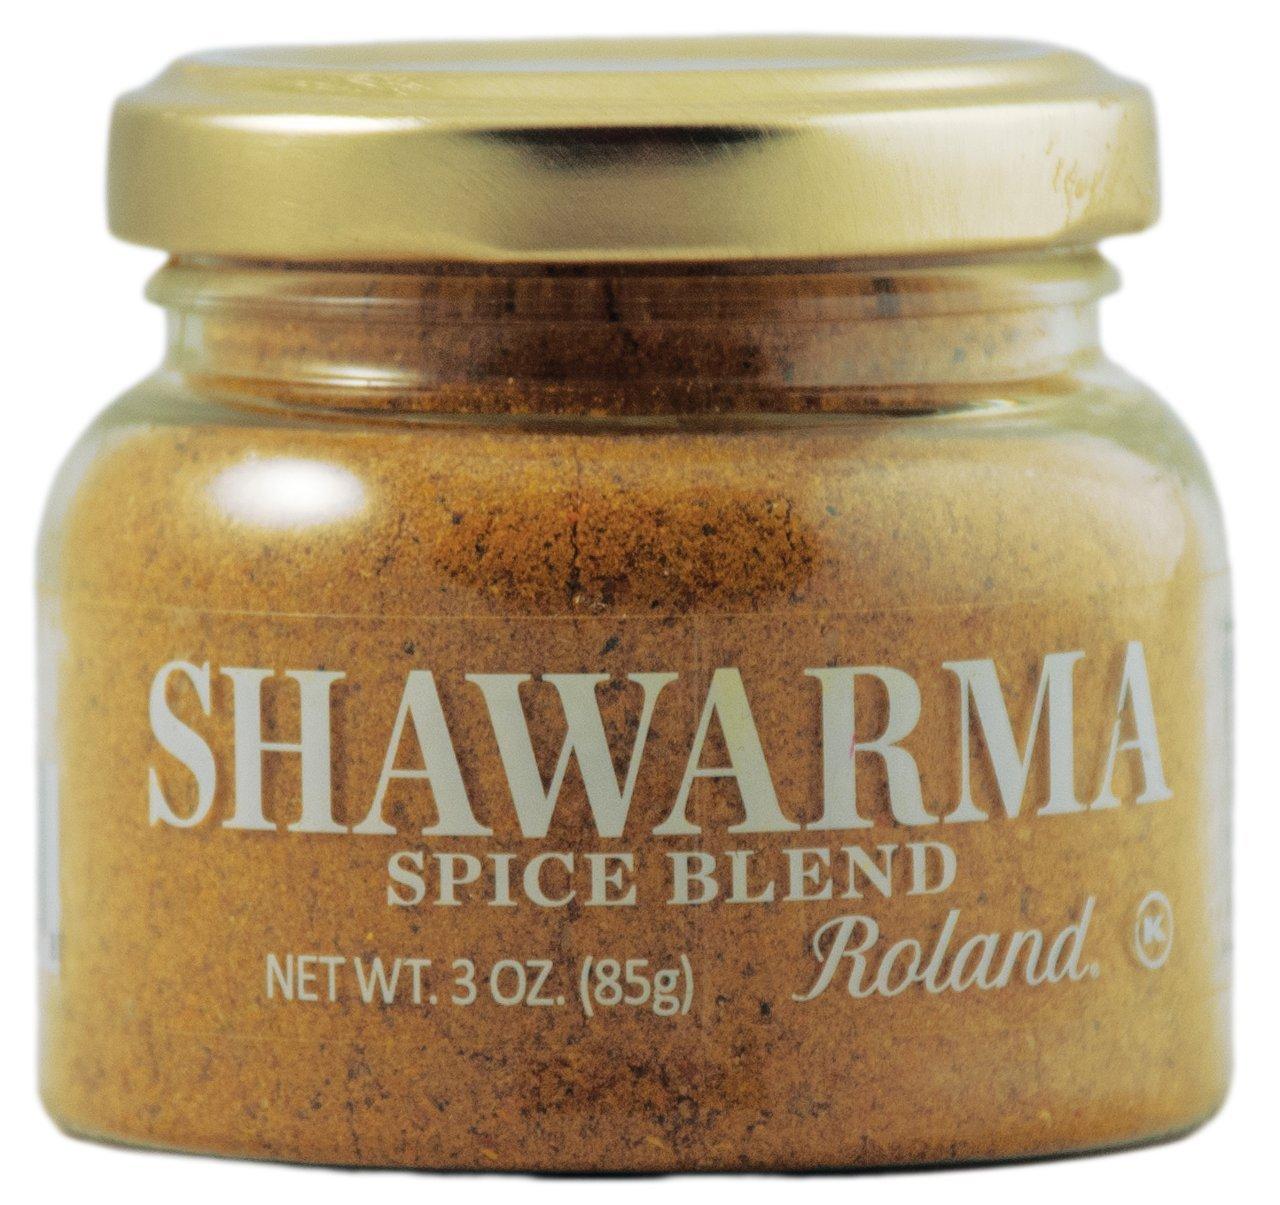 shawarma spice blend roland